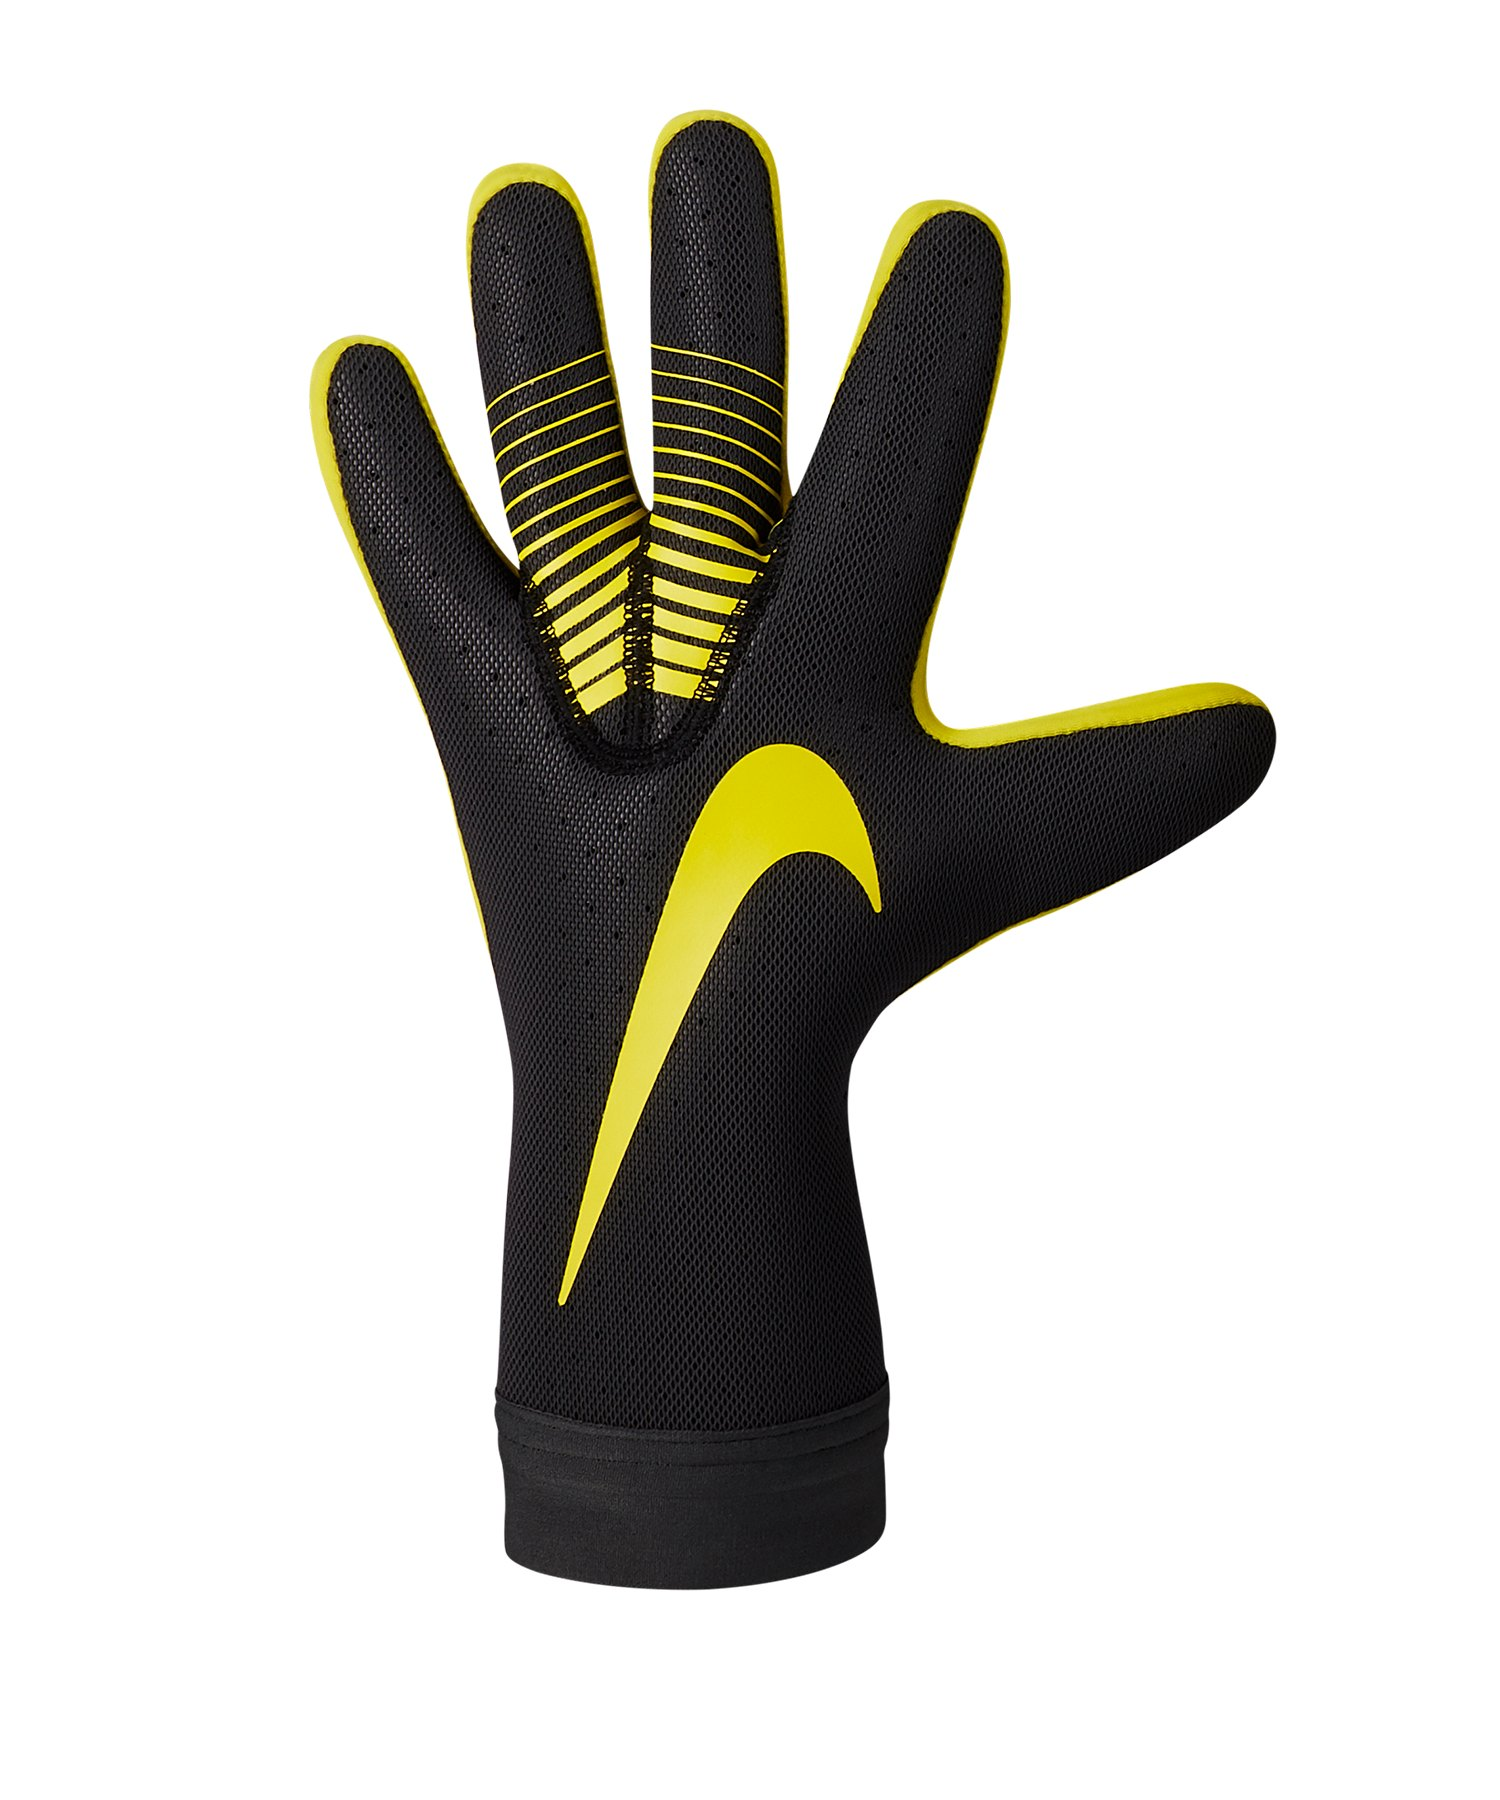 Nike Mercurial Touch Elite Torwarthandschuh F060 - grau